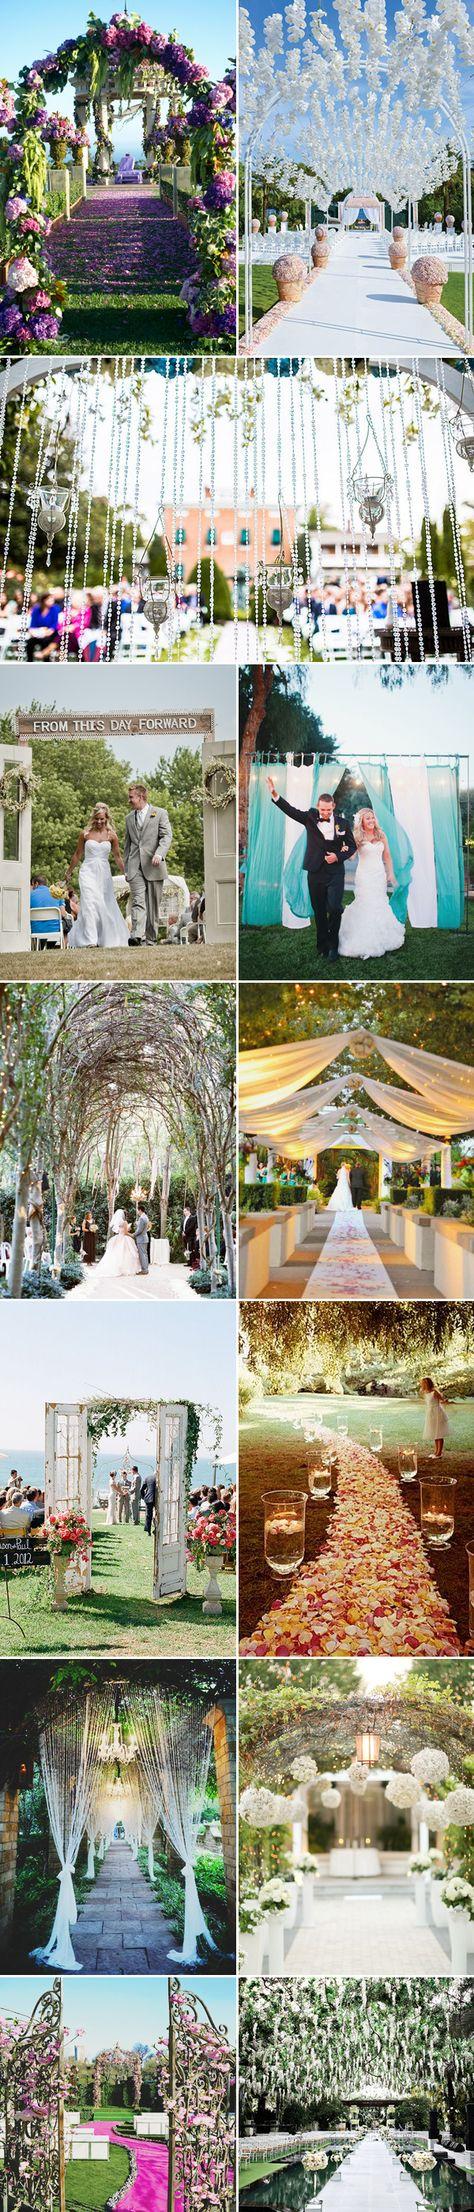 Wedding entry decoration ideas  Making a Beautiful Entrance  Creative Wedding Entrance Decor